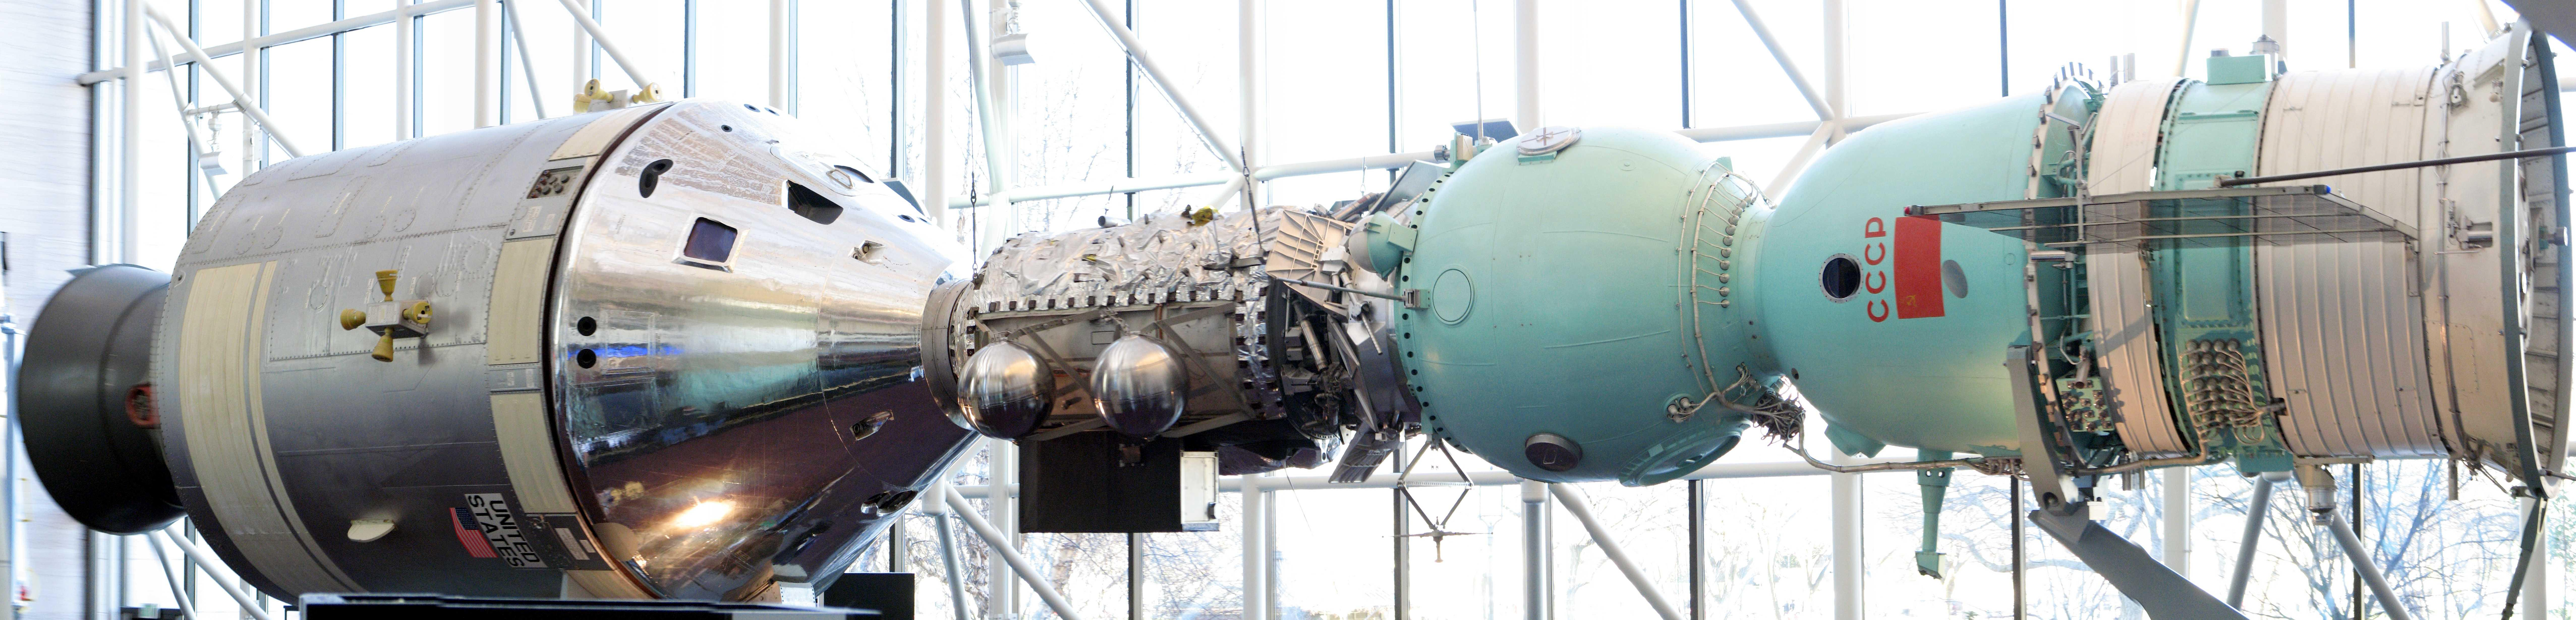 apollo spacecraft - photo #37